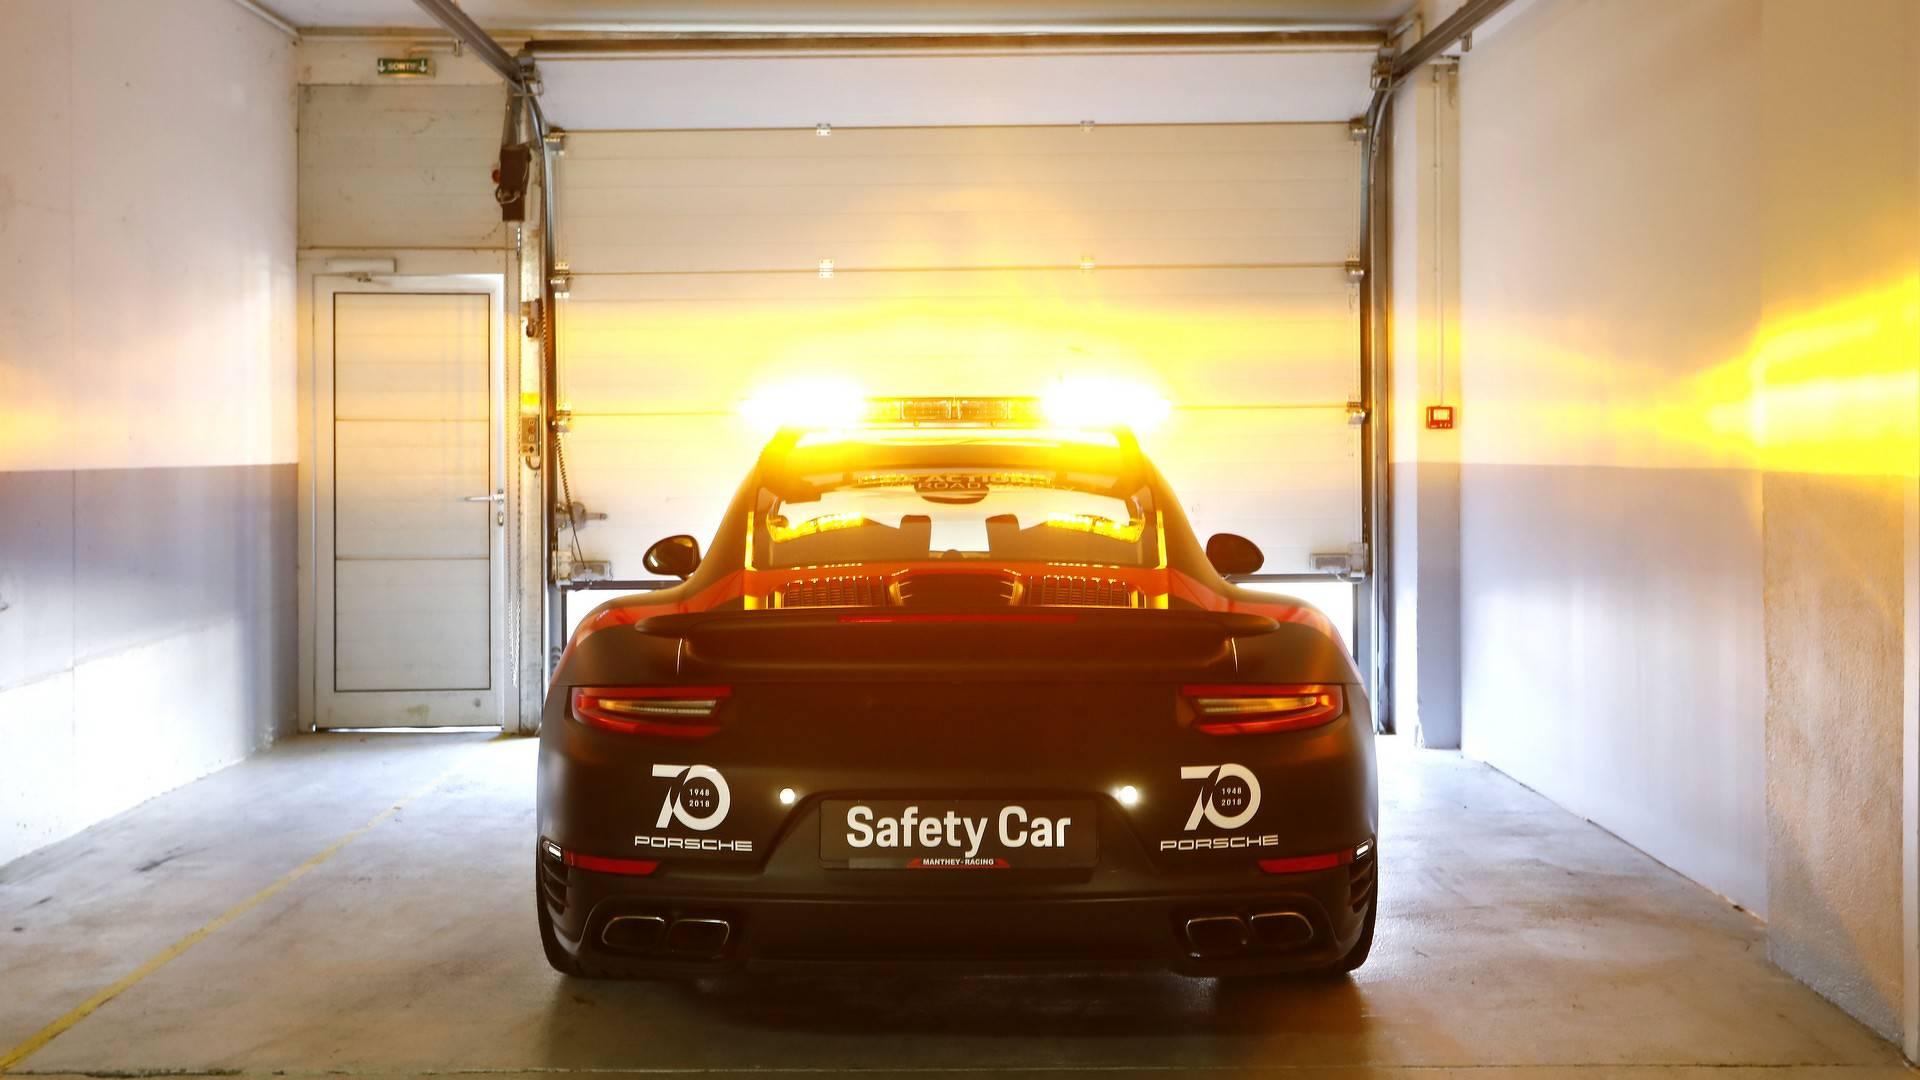 Porsche 911 World Endurance Championship Safety Car